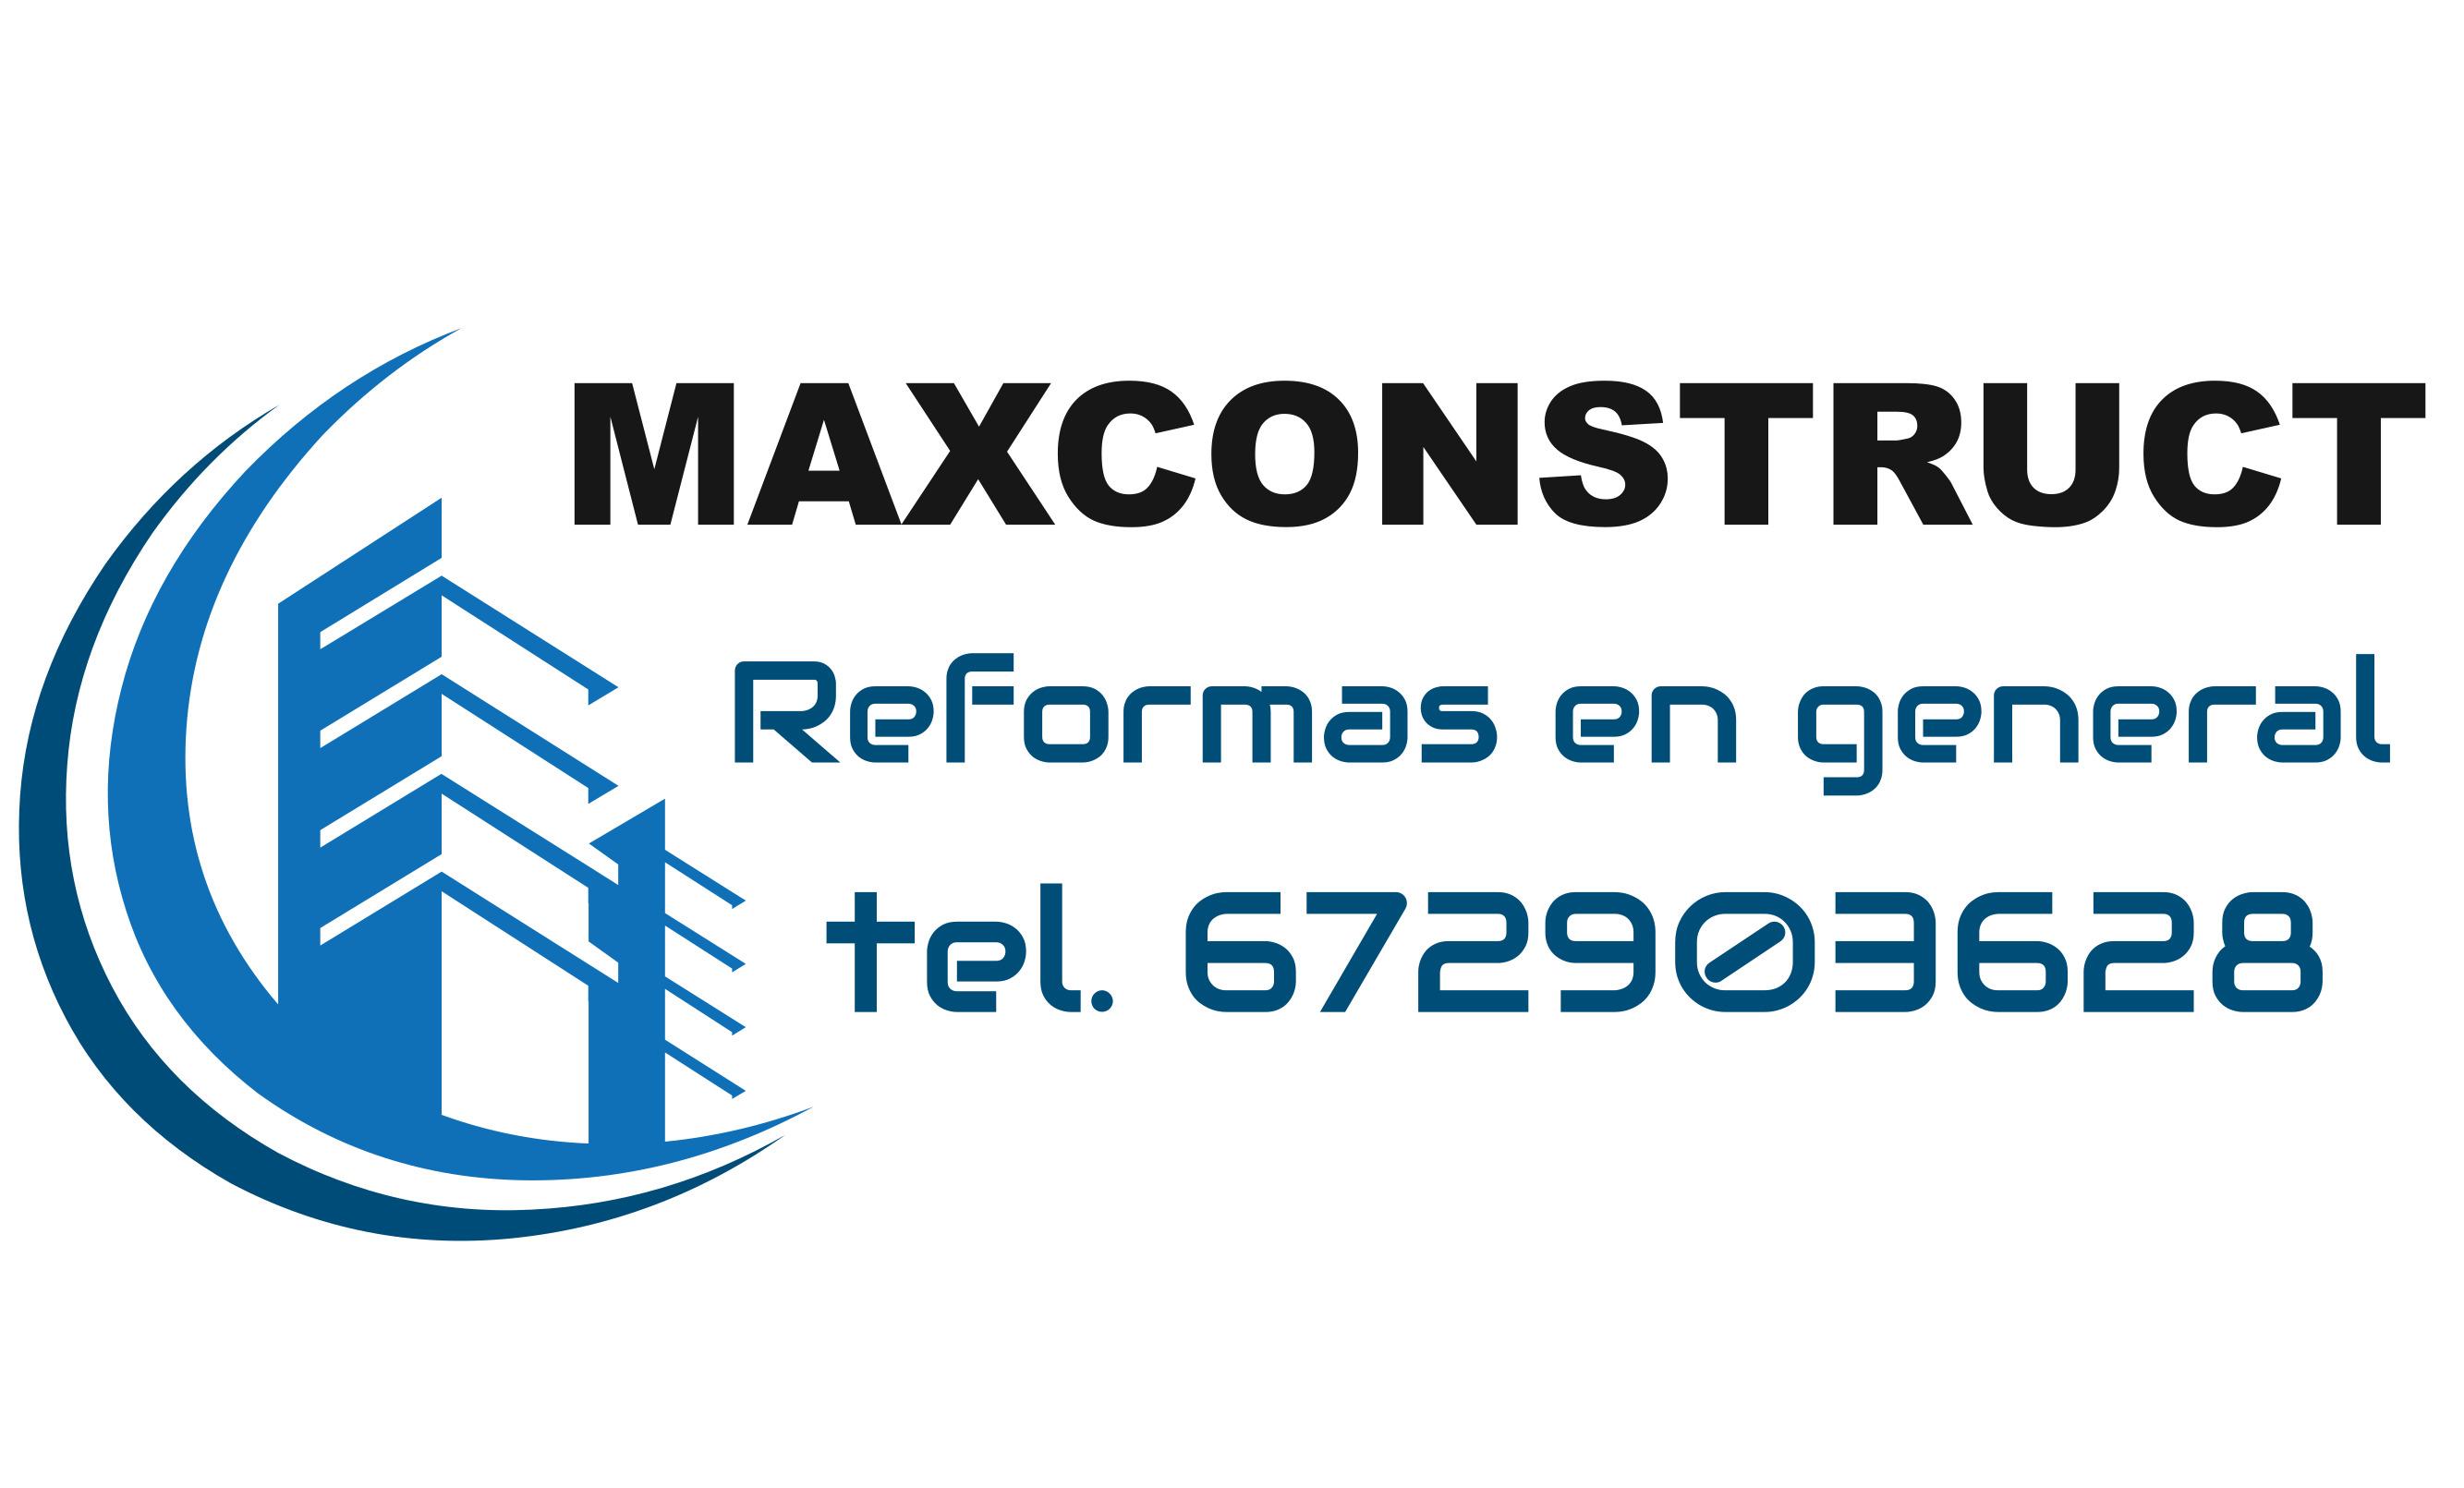 Maxconstruct S.c